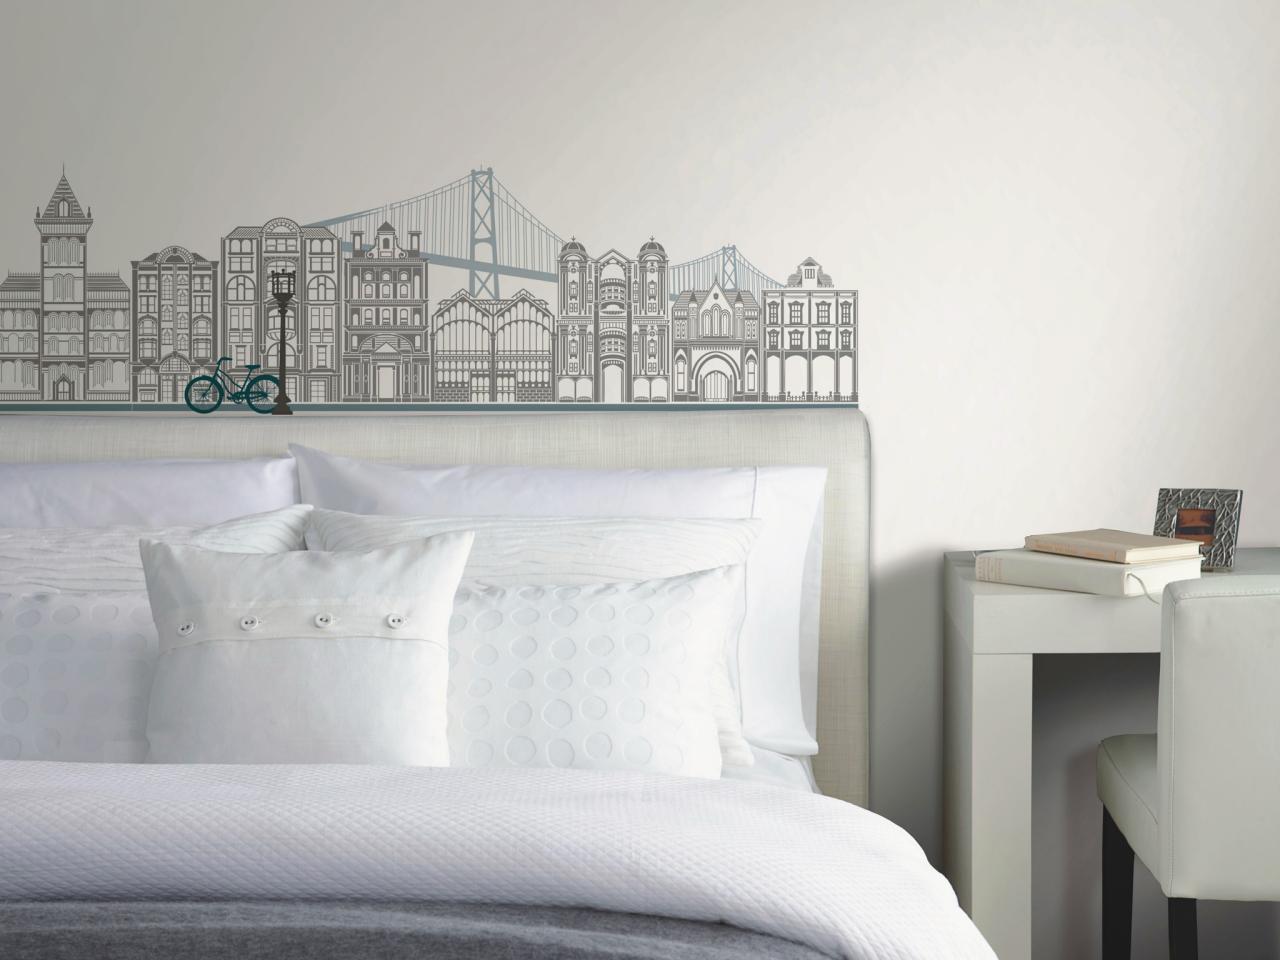 make over your walls ci_wallpops dorm room decor globetrotter decal_h chic design dorm room ideas